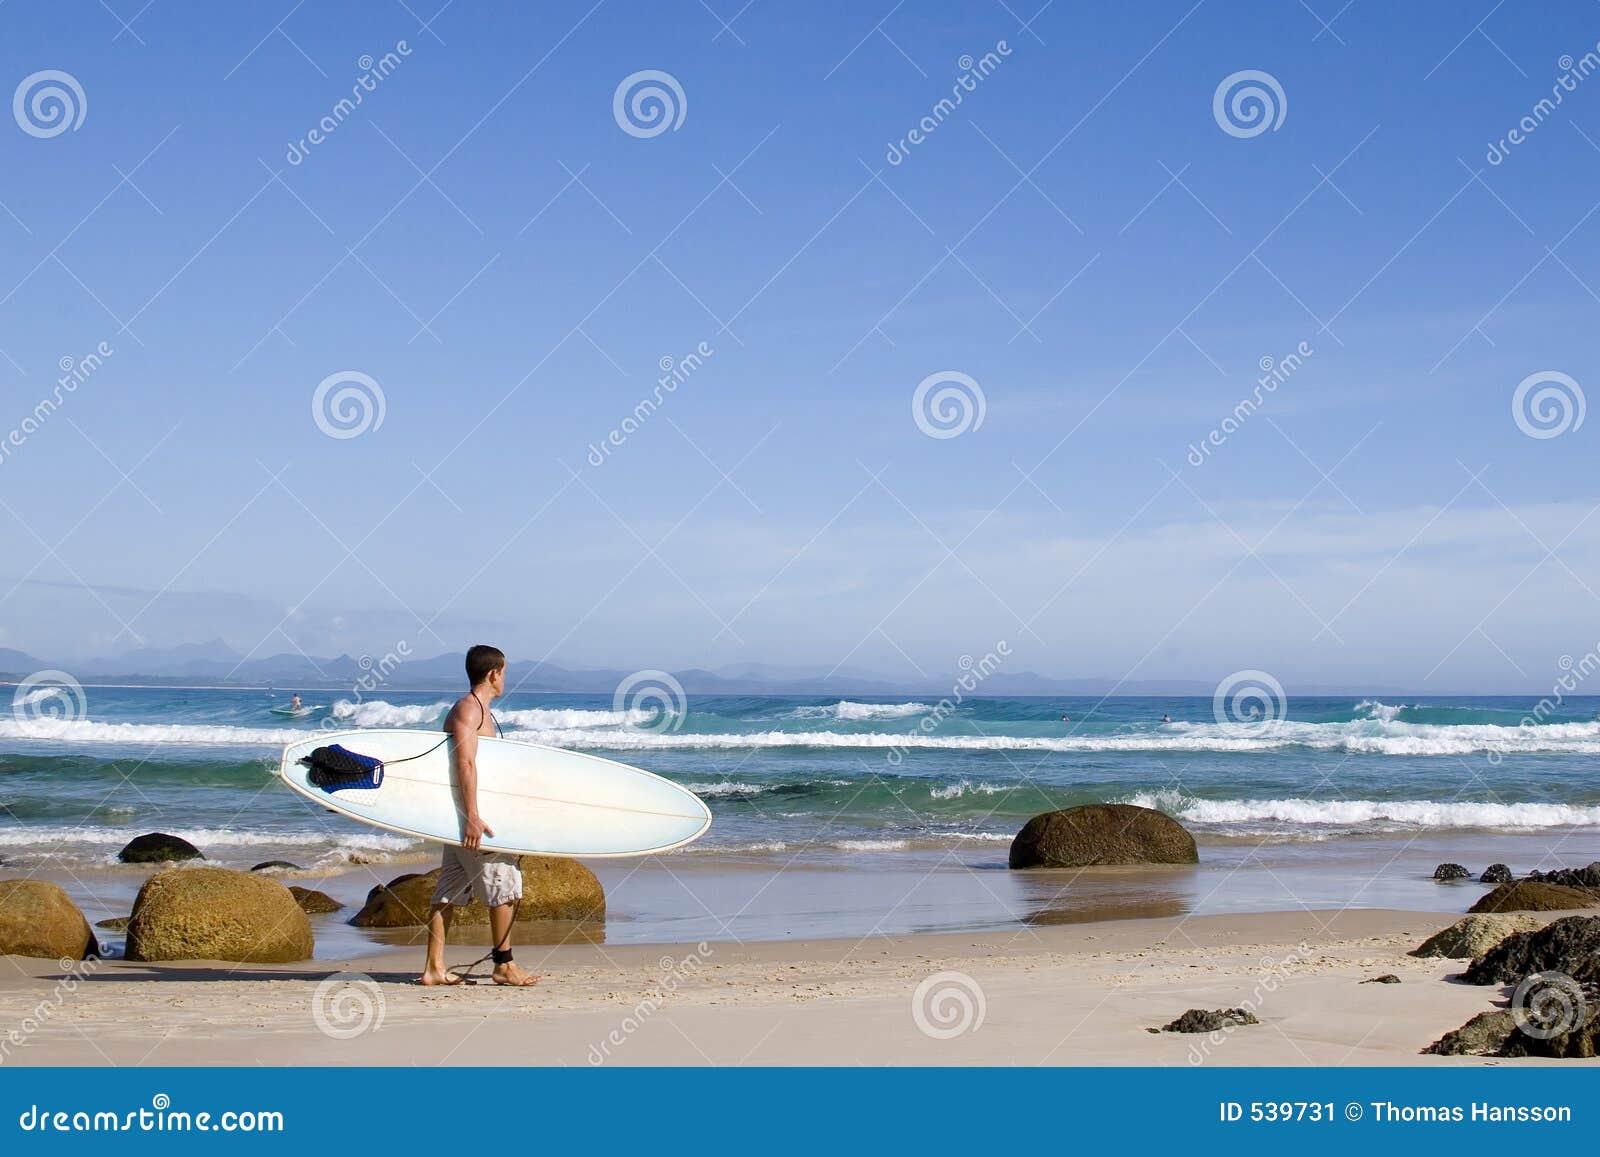 Download 3澳洲海湾byron冲浪者 库存图片. 图片 包括有 裂口, 小珠靠岸的, 生活方式, 放松, 聊天, 户外 - 539731